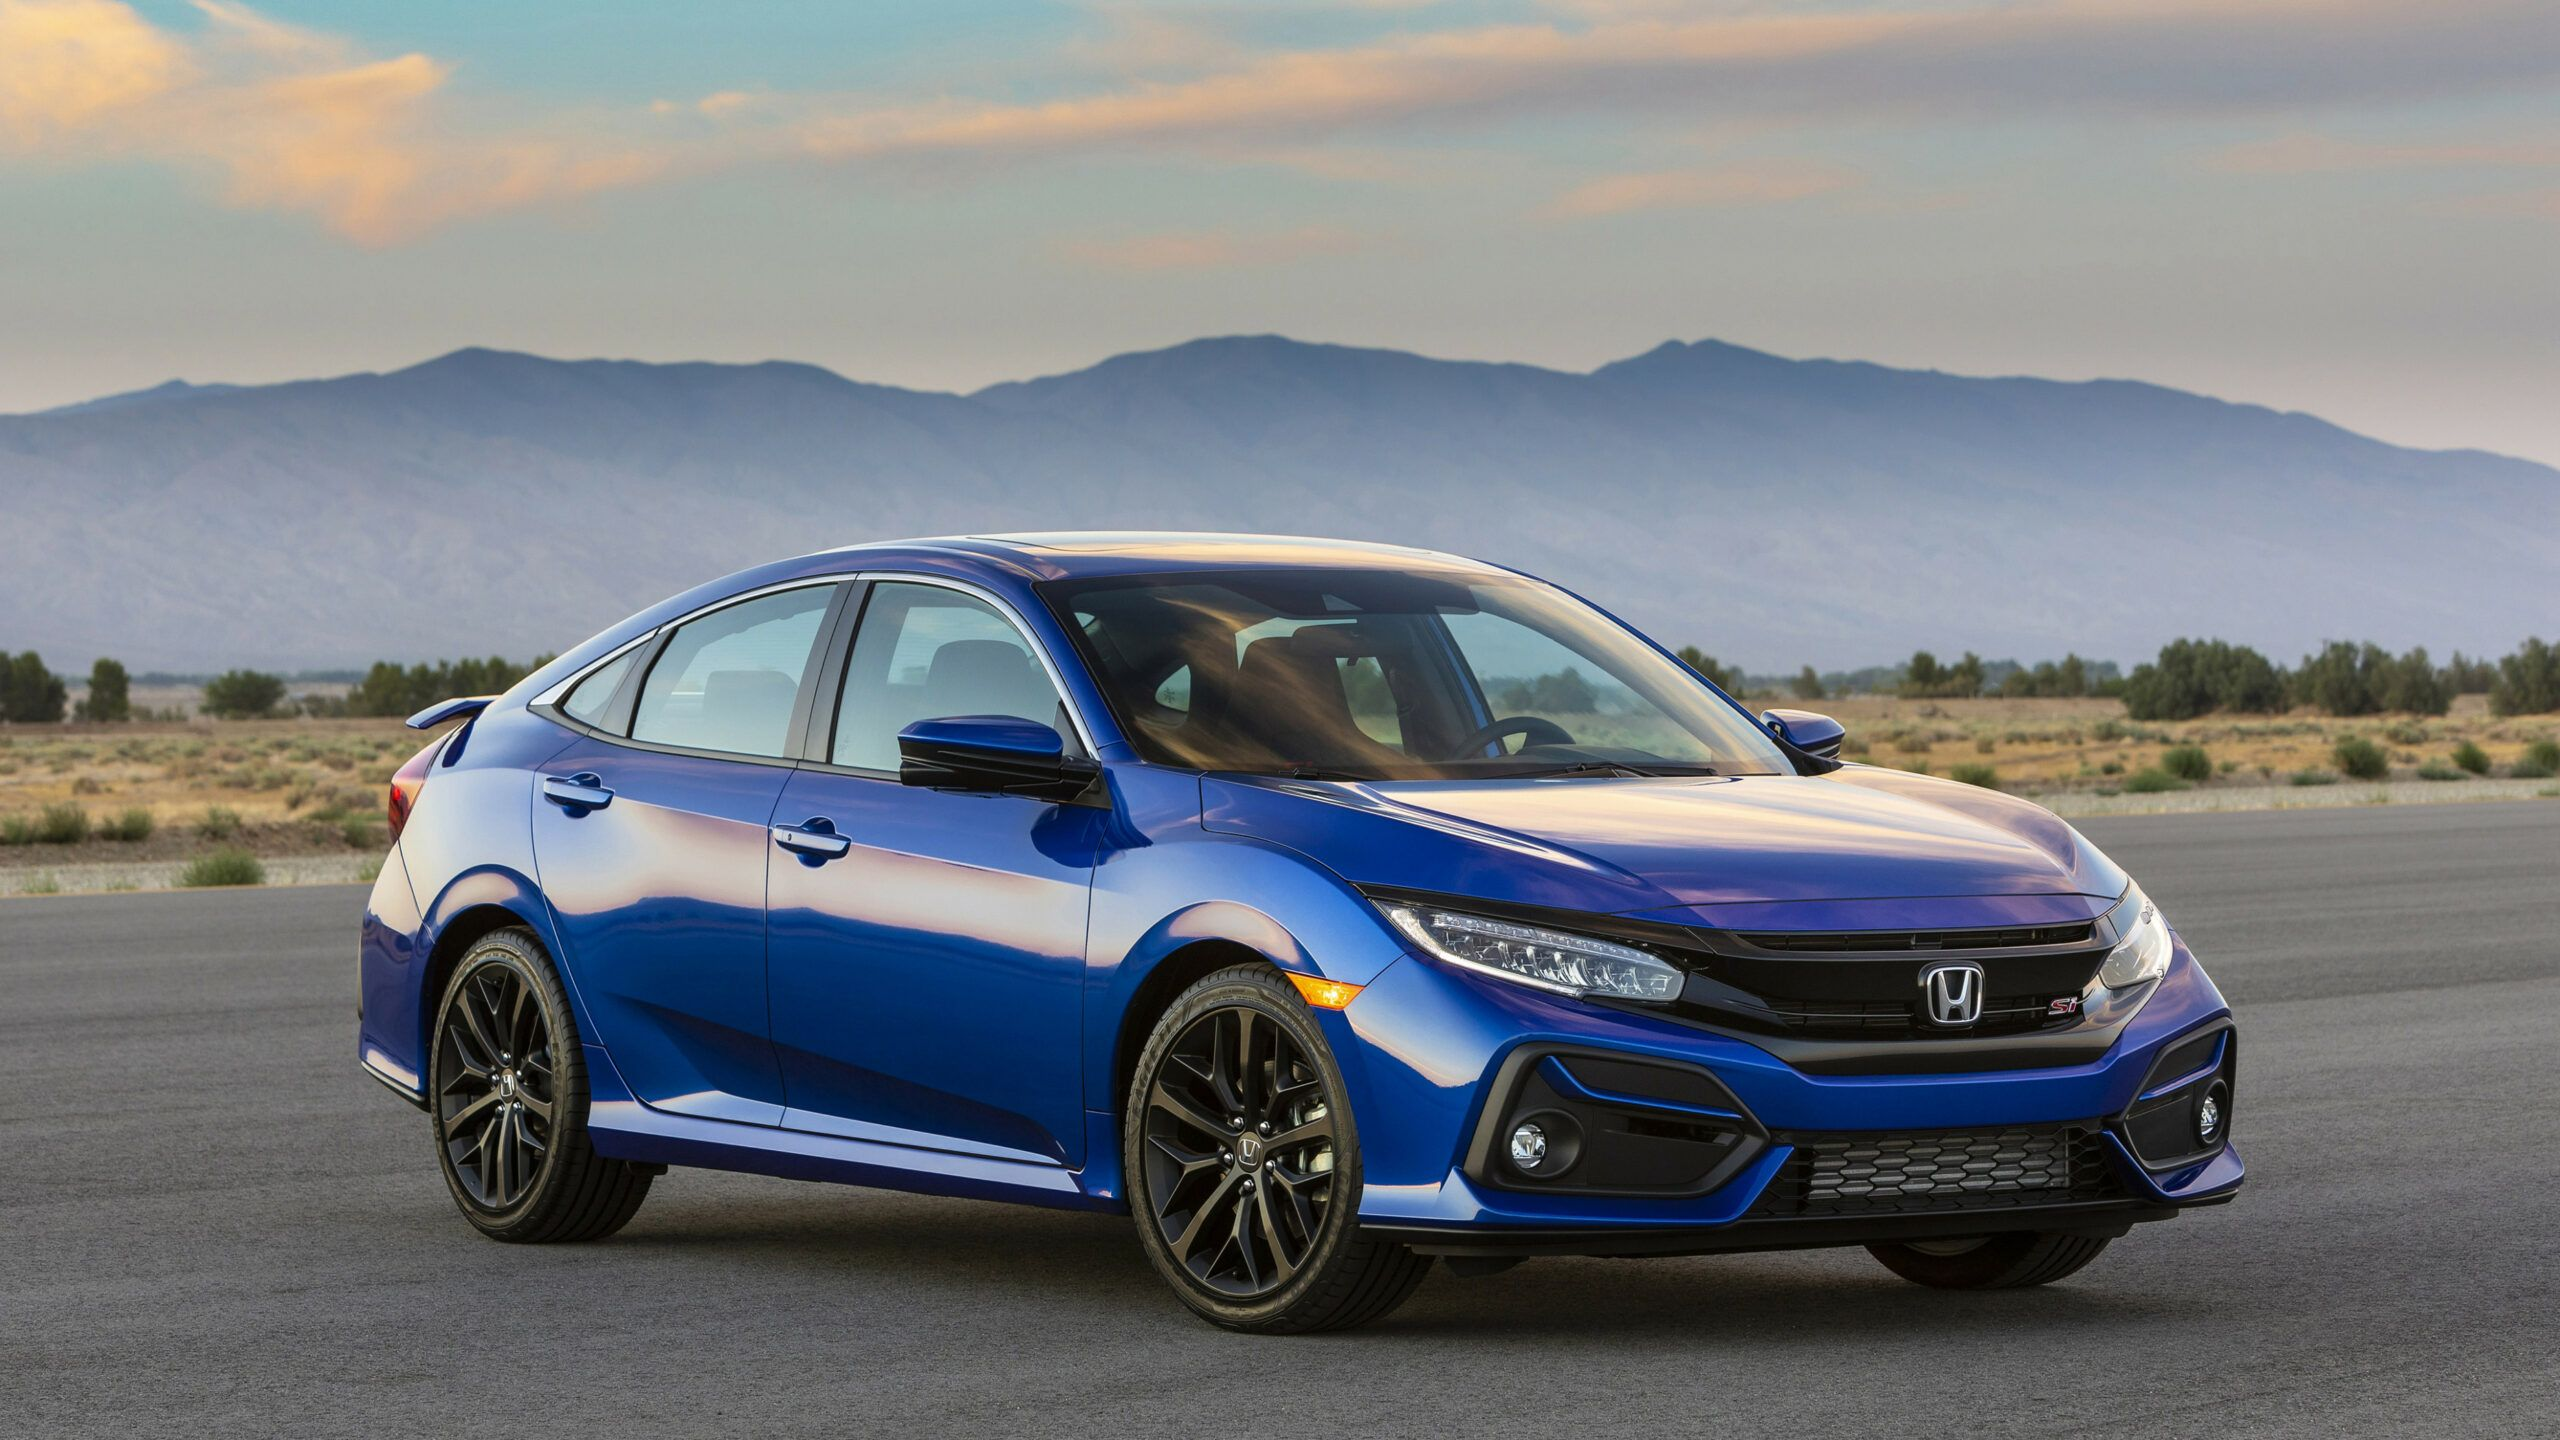 2020 Honda Civic Si in 2020 Honda civic si, Honda civic